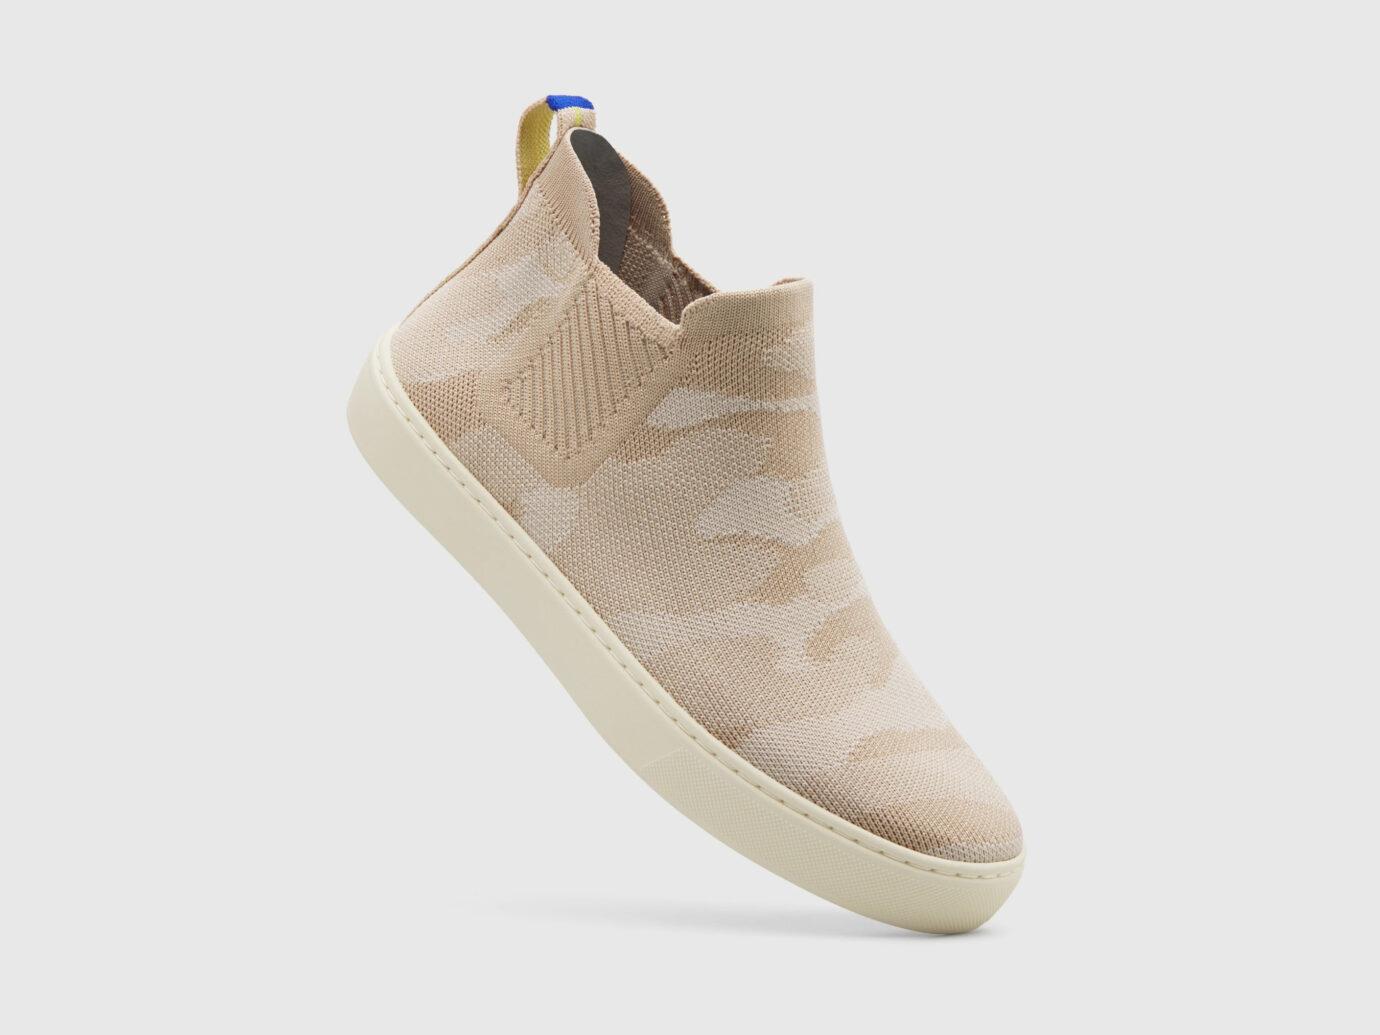 Rothy's Sand Camo Chelsea Shoe